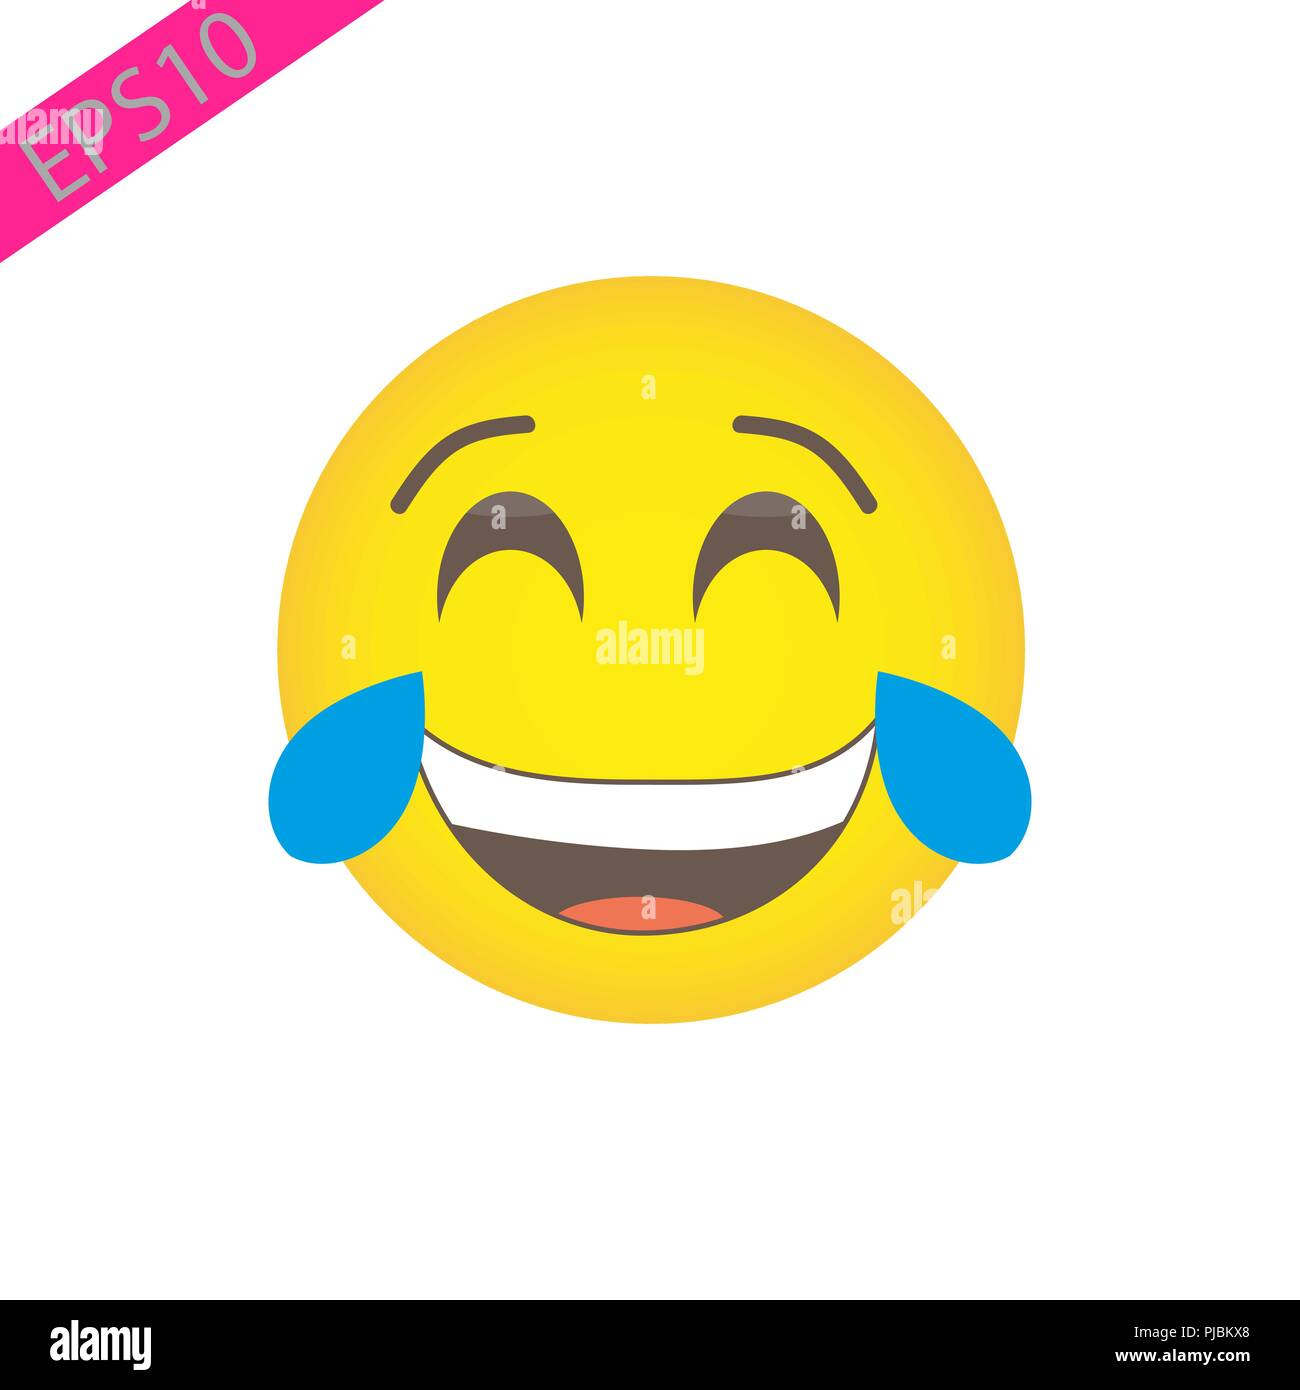 smiley face template - Ataum berglauf-verband com